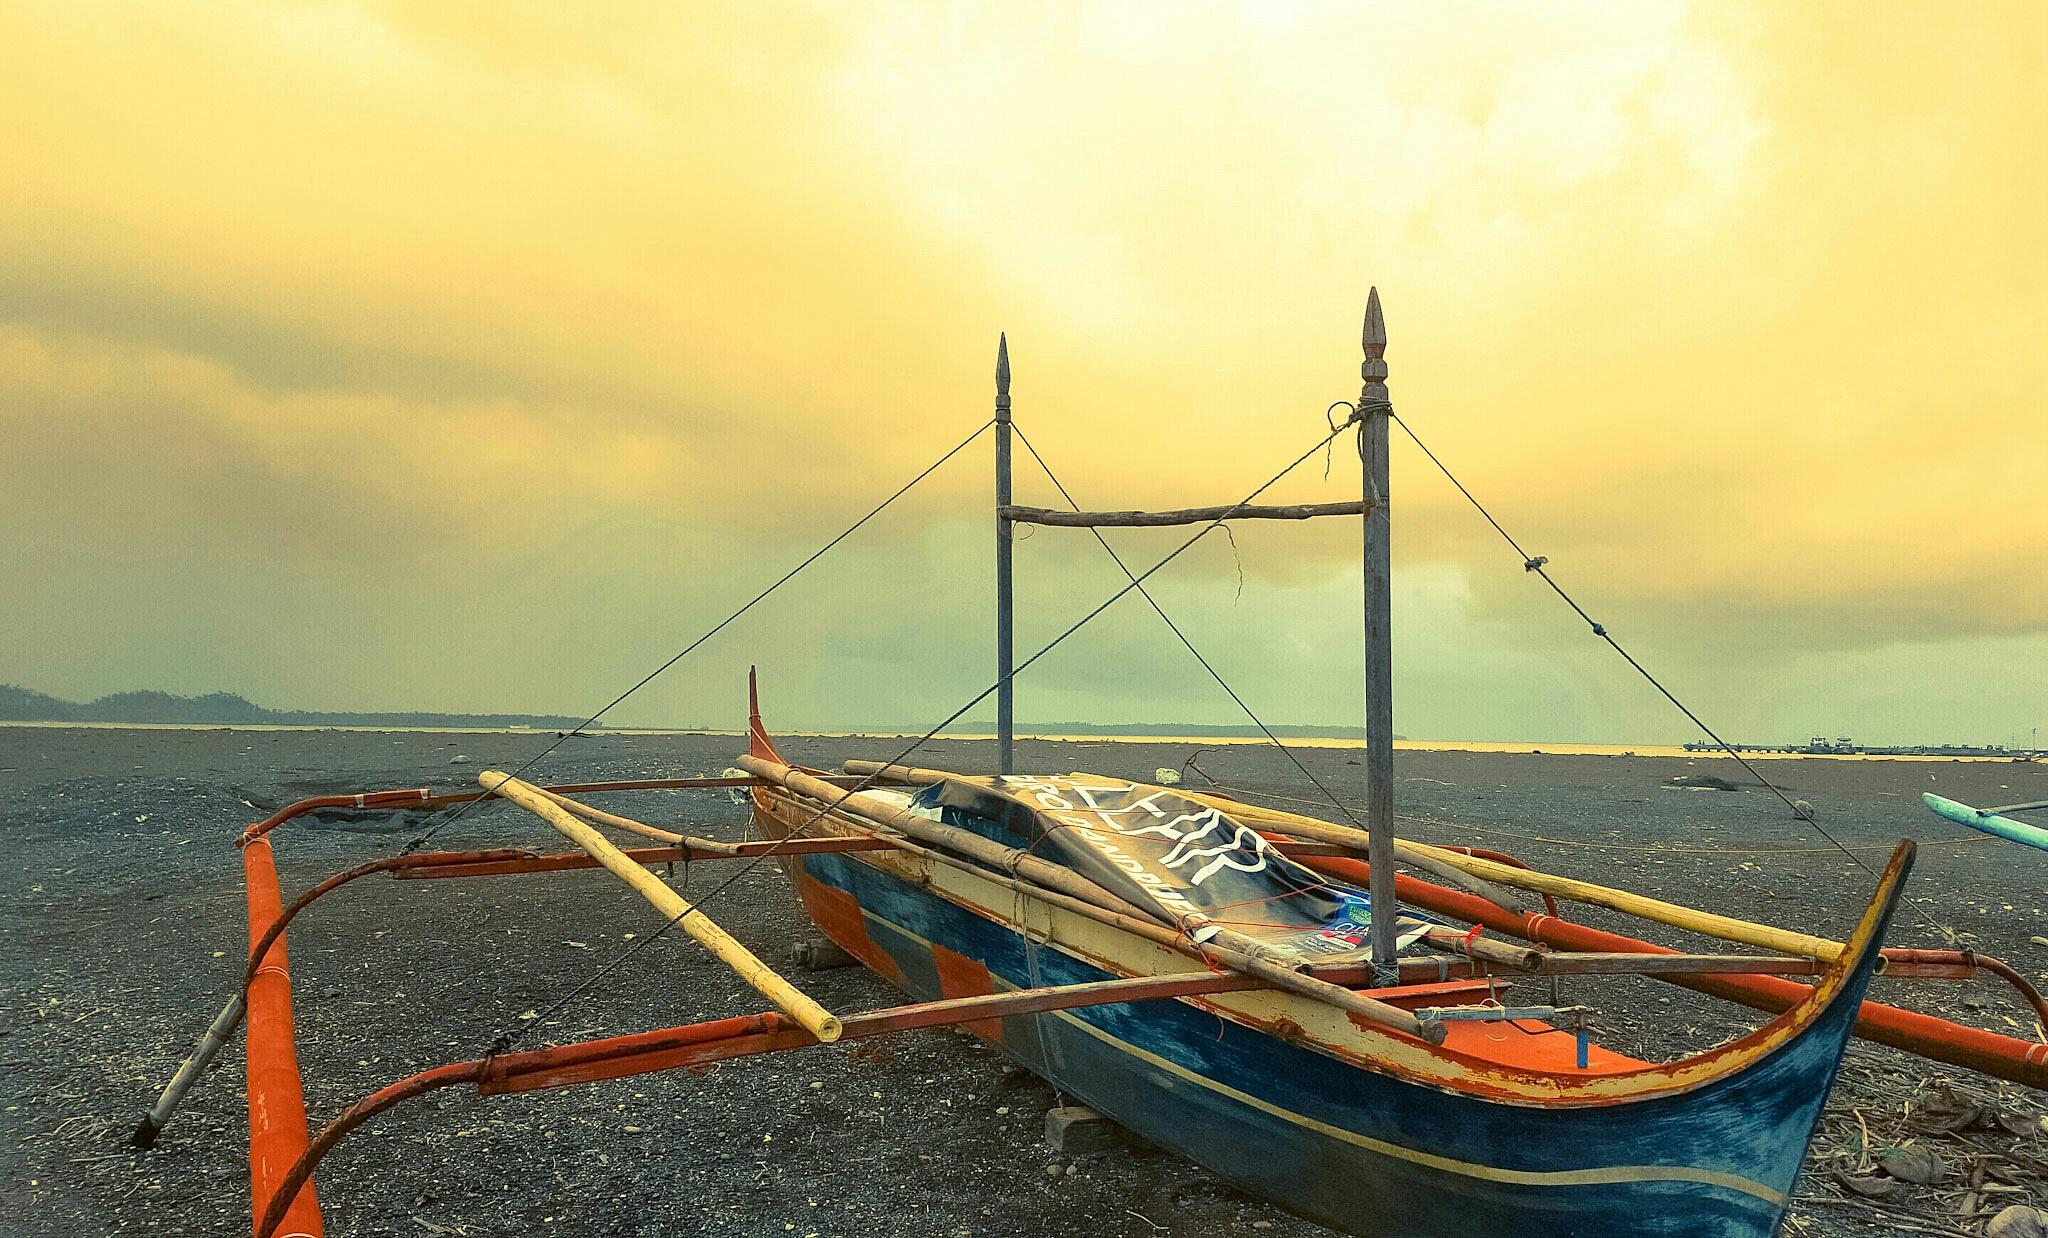 Rustic Fishing Boat by Erlinda Bocar Kantor